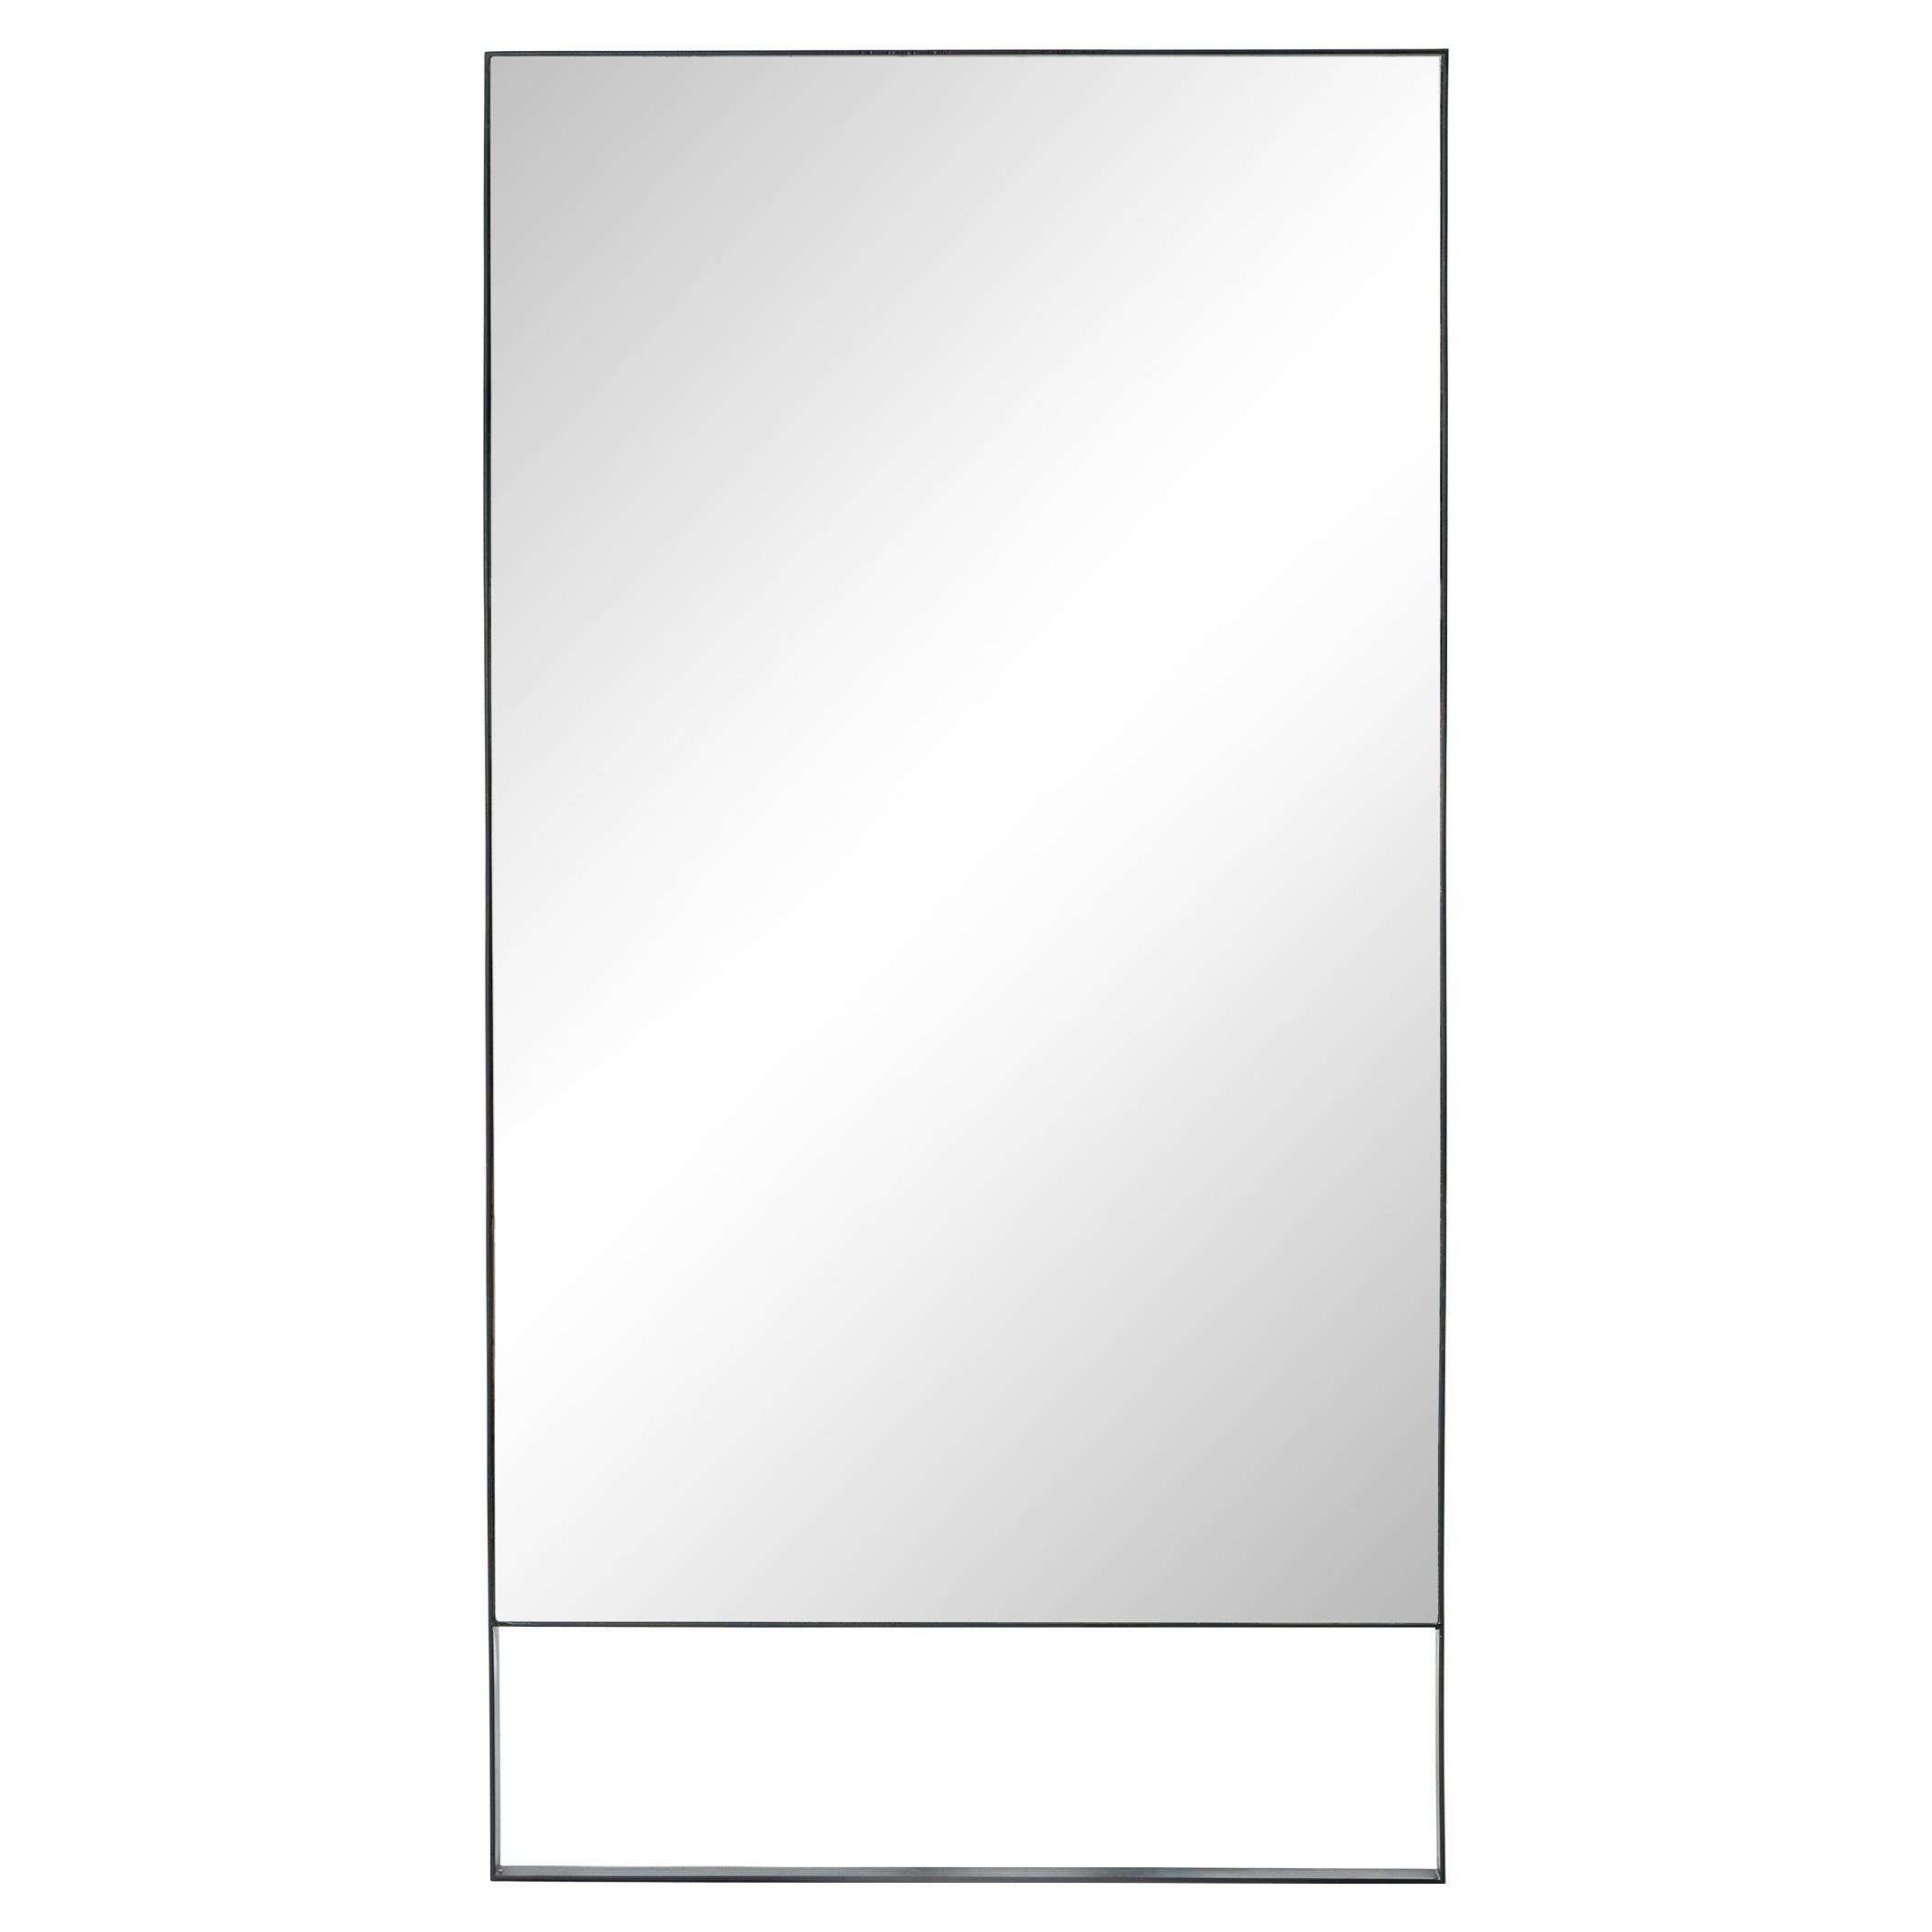 Designer Floor Mirrors - Eclectic Floor Mirrors   Kathy Kuo Home